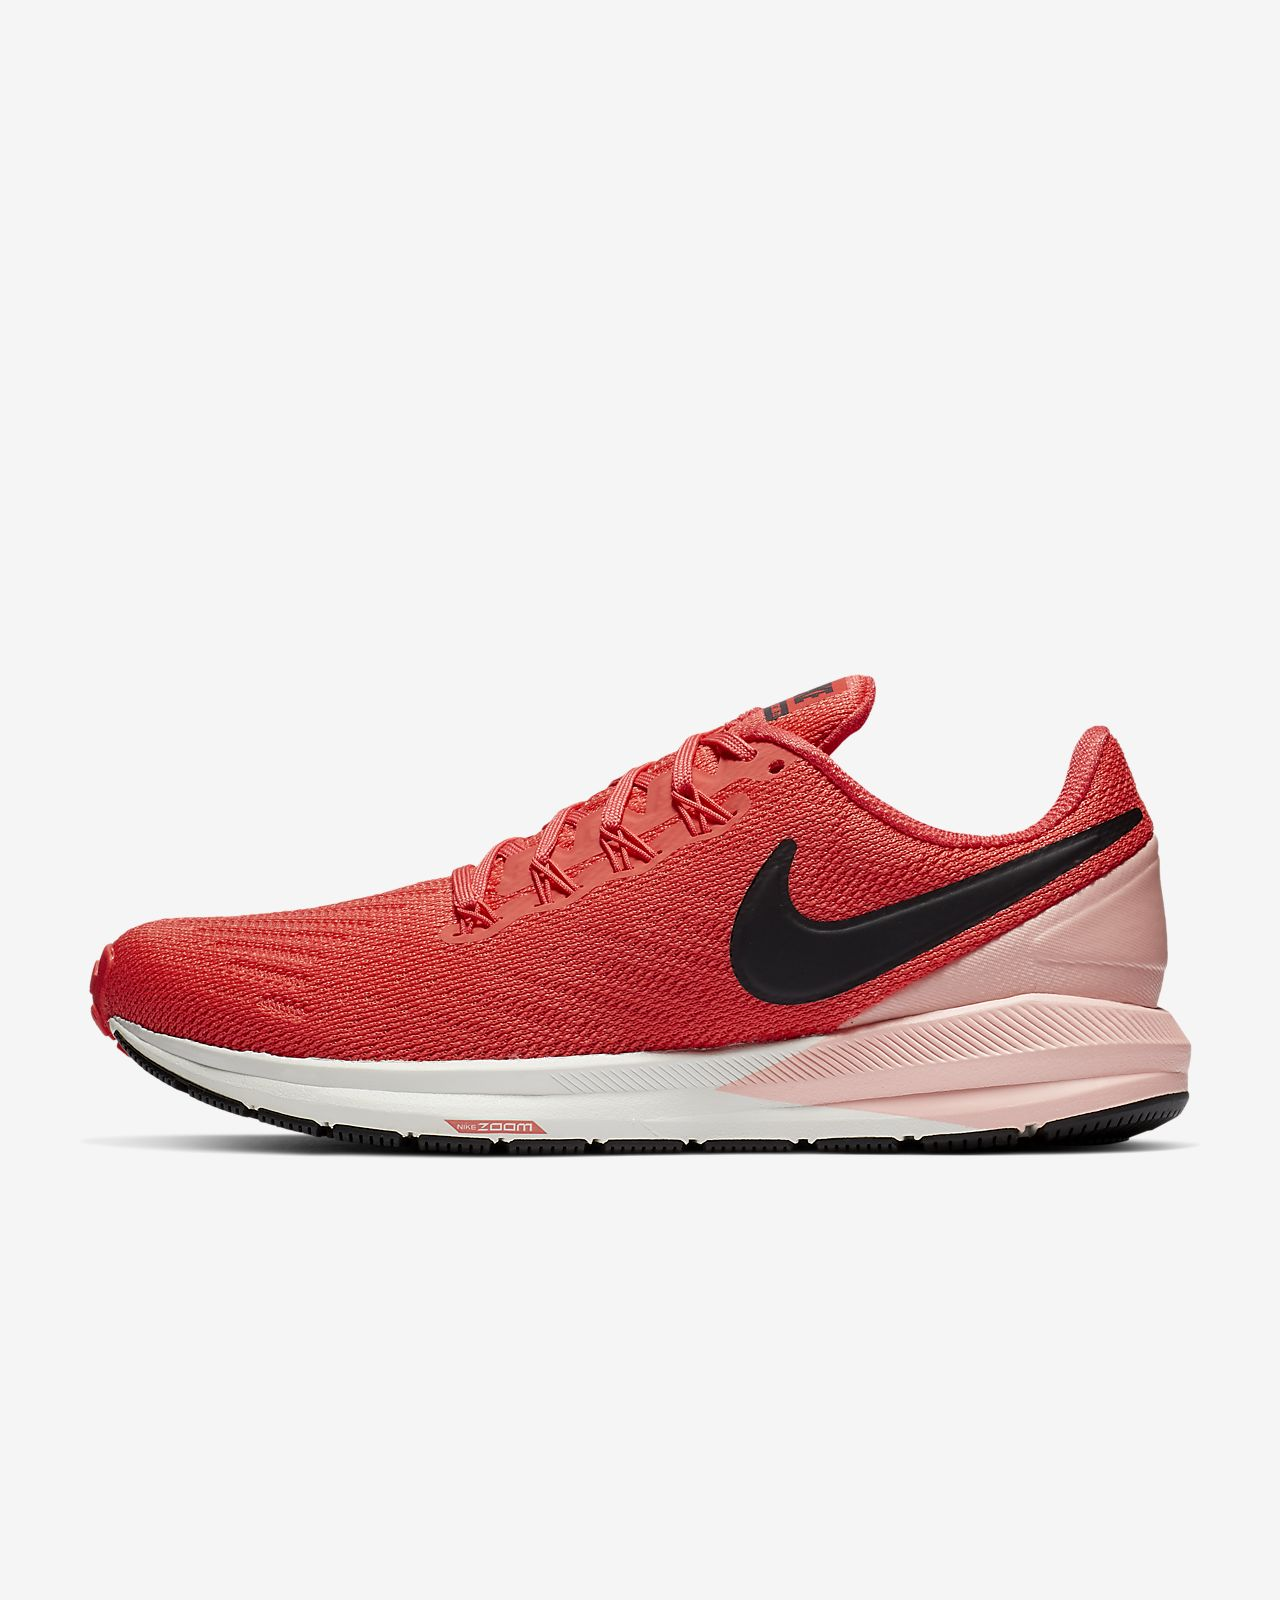 f2561dfdfab0 Nike Air Zoom Structure 22 Women s Running Shoe. Nike.com NO